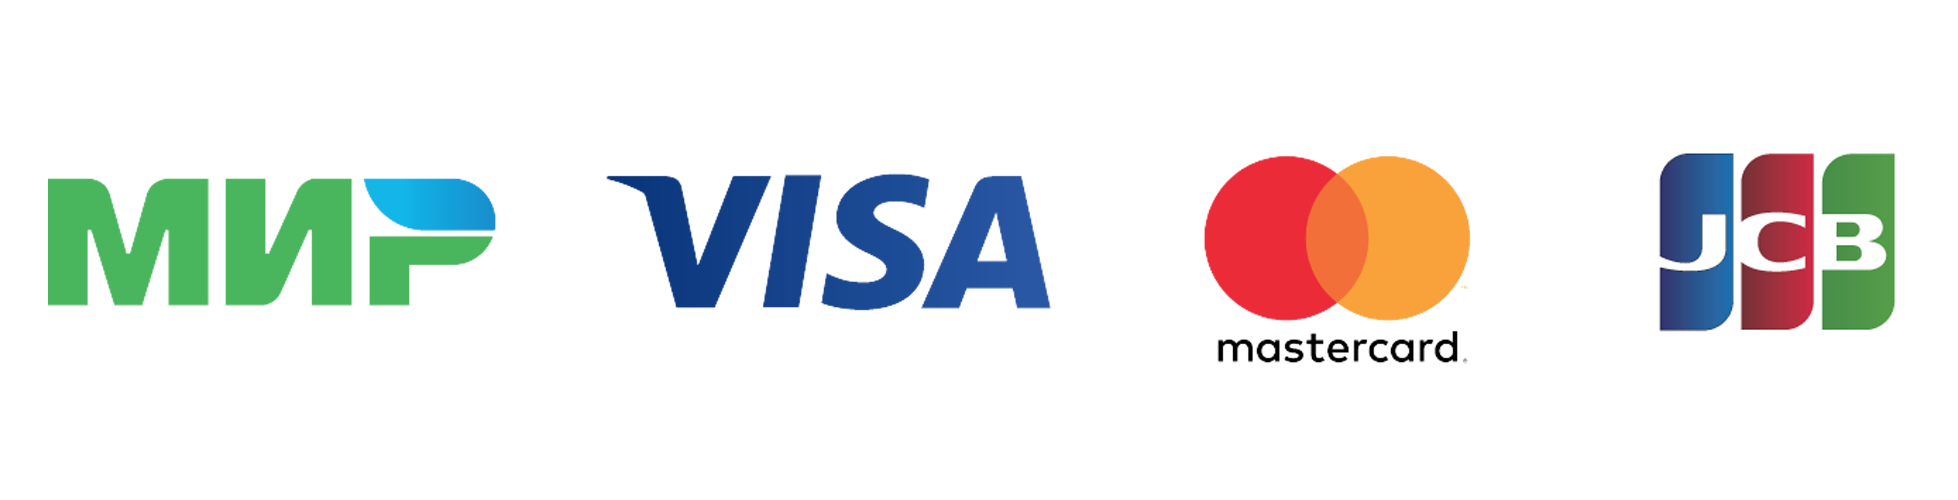 pay_logos.png